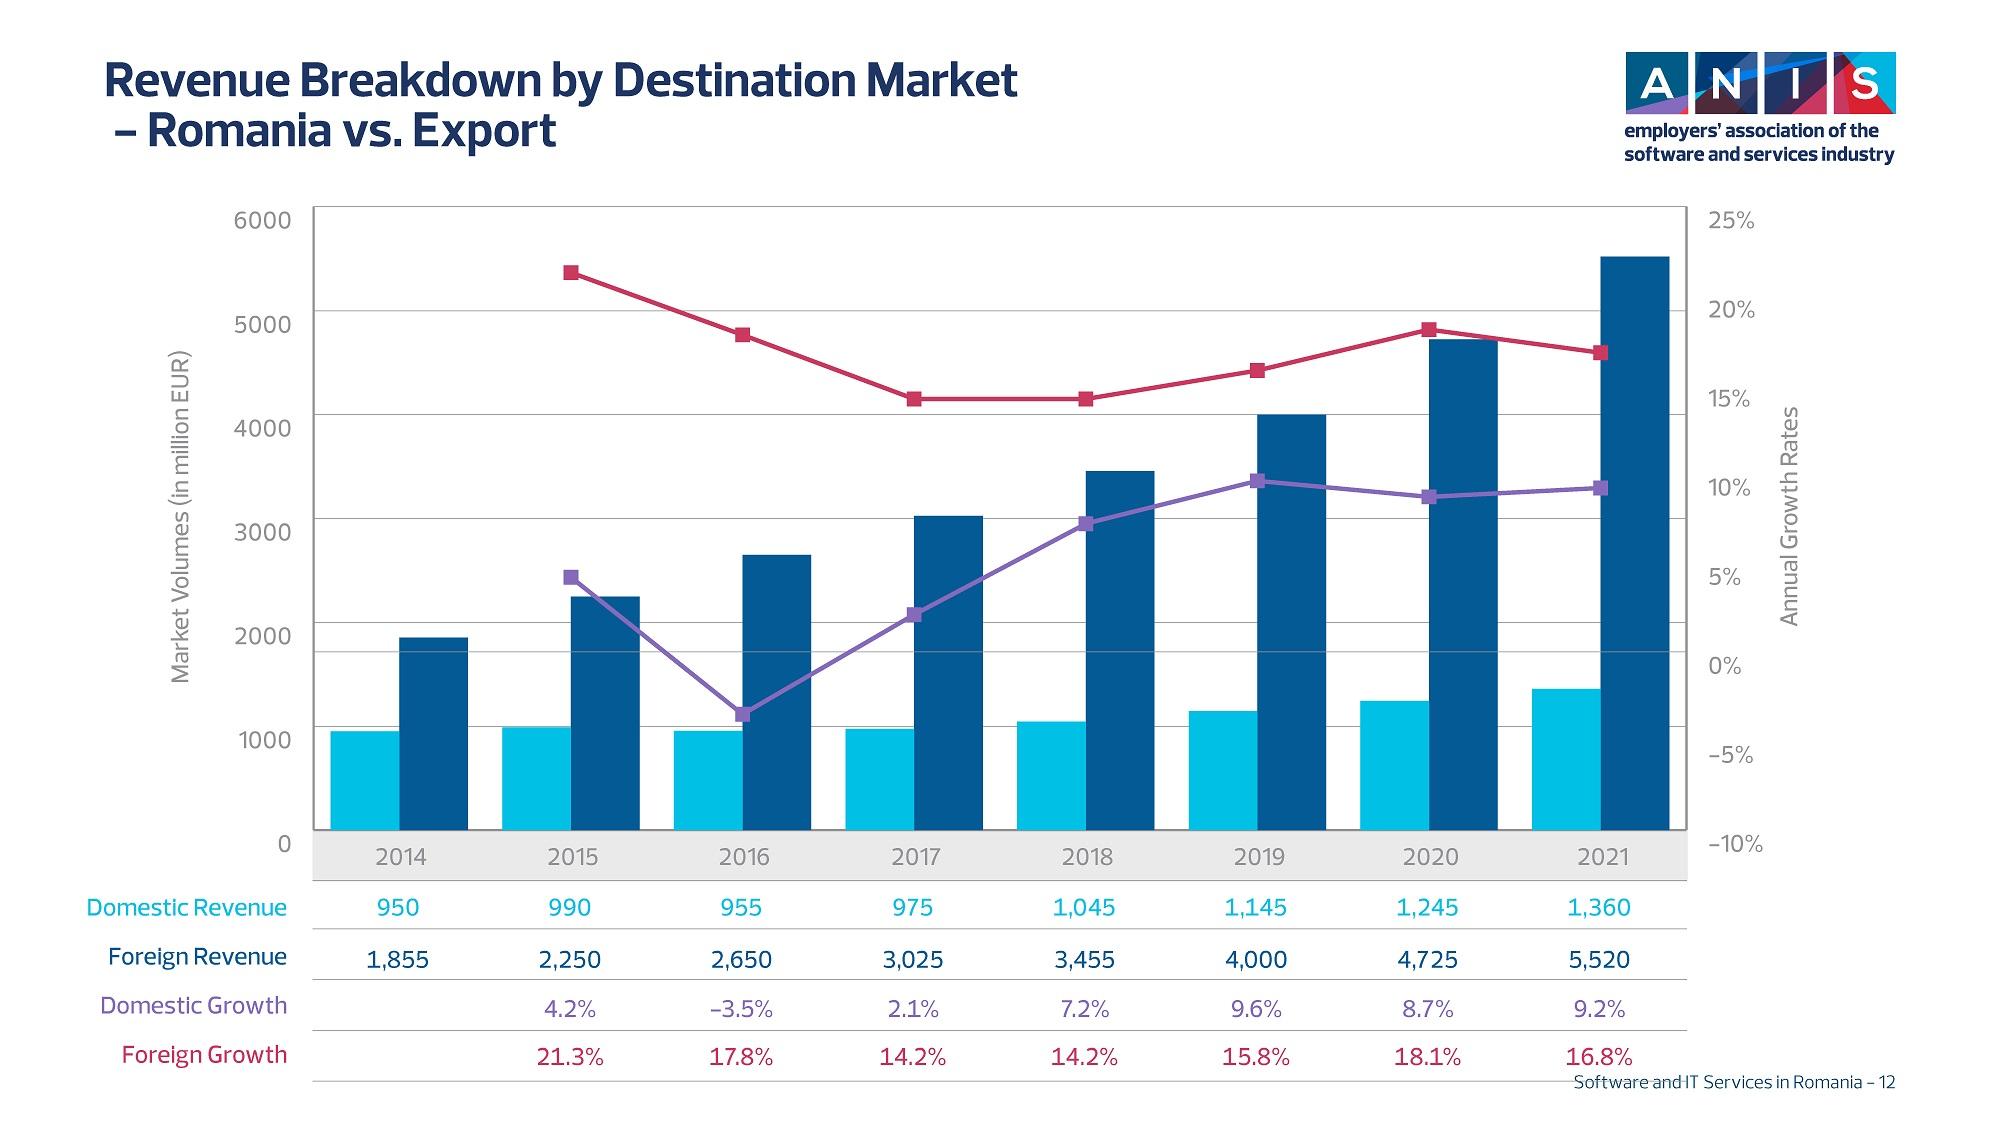 5. Revenue Breakdown by Destination Market_s